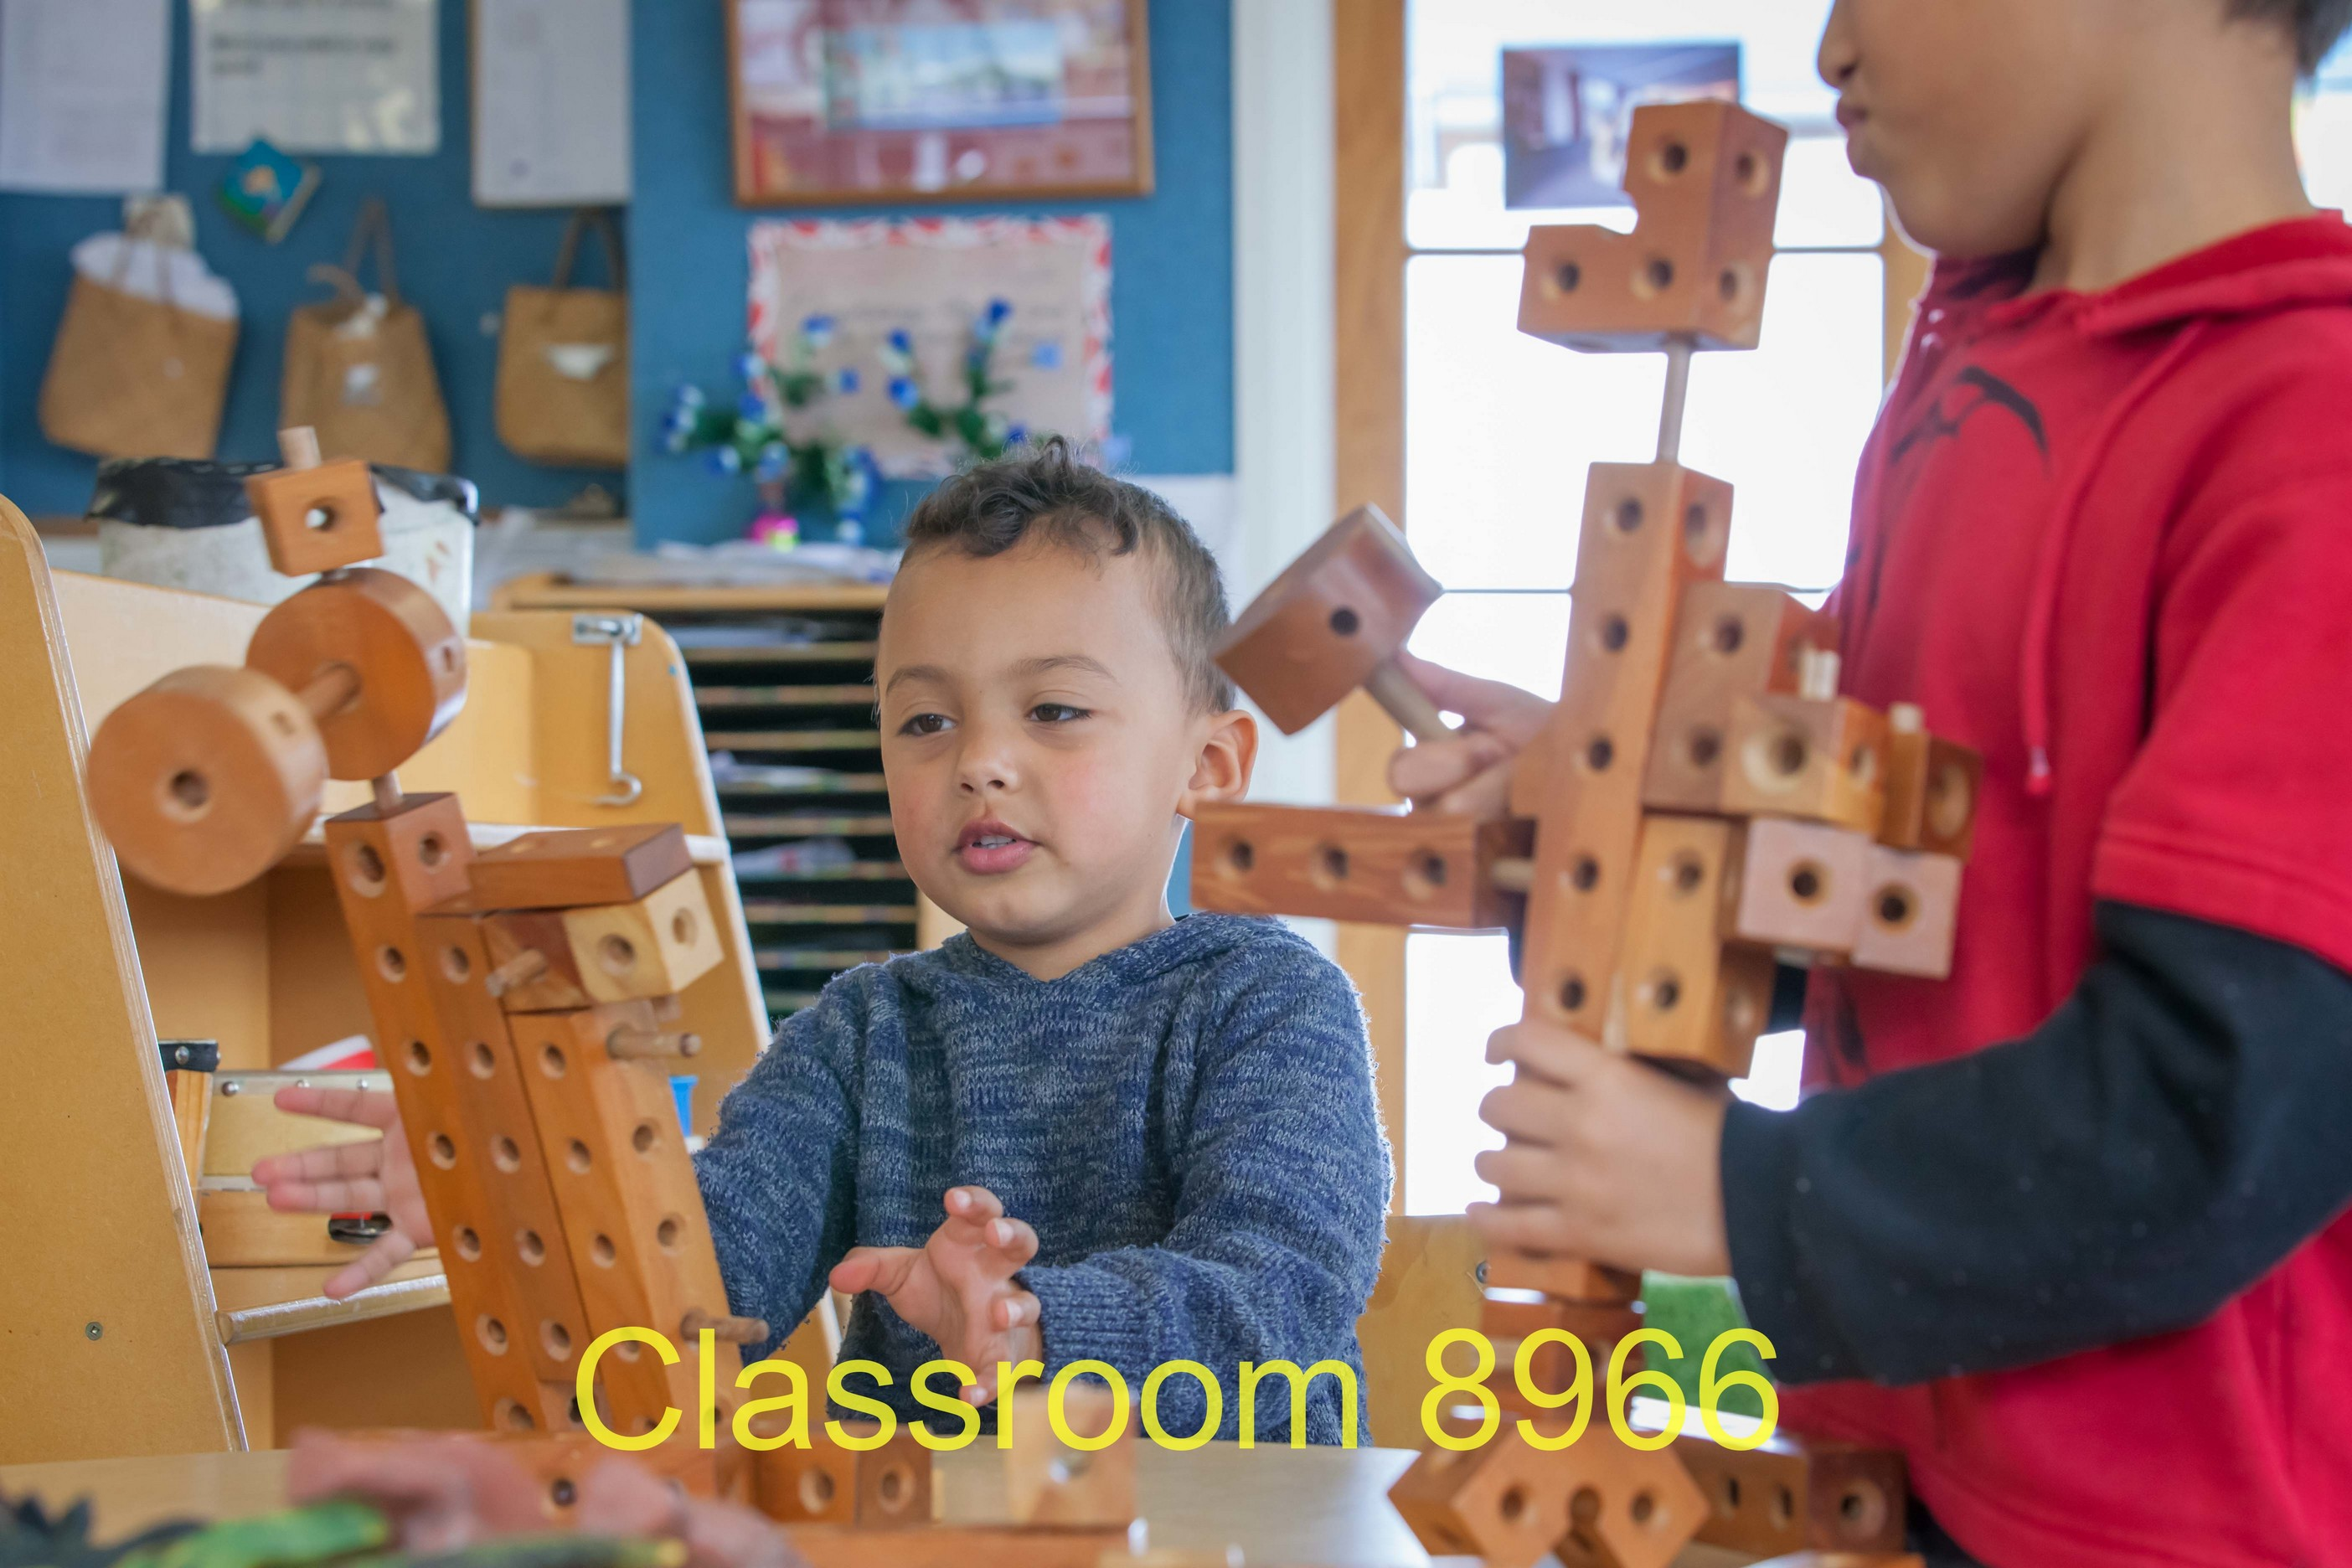 Classroom 8966